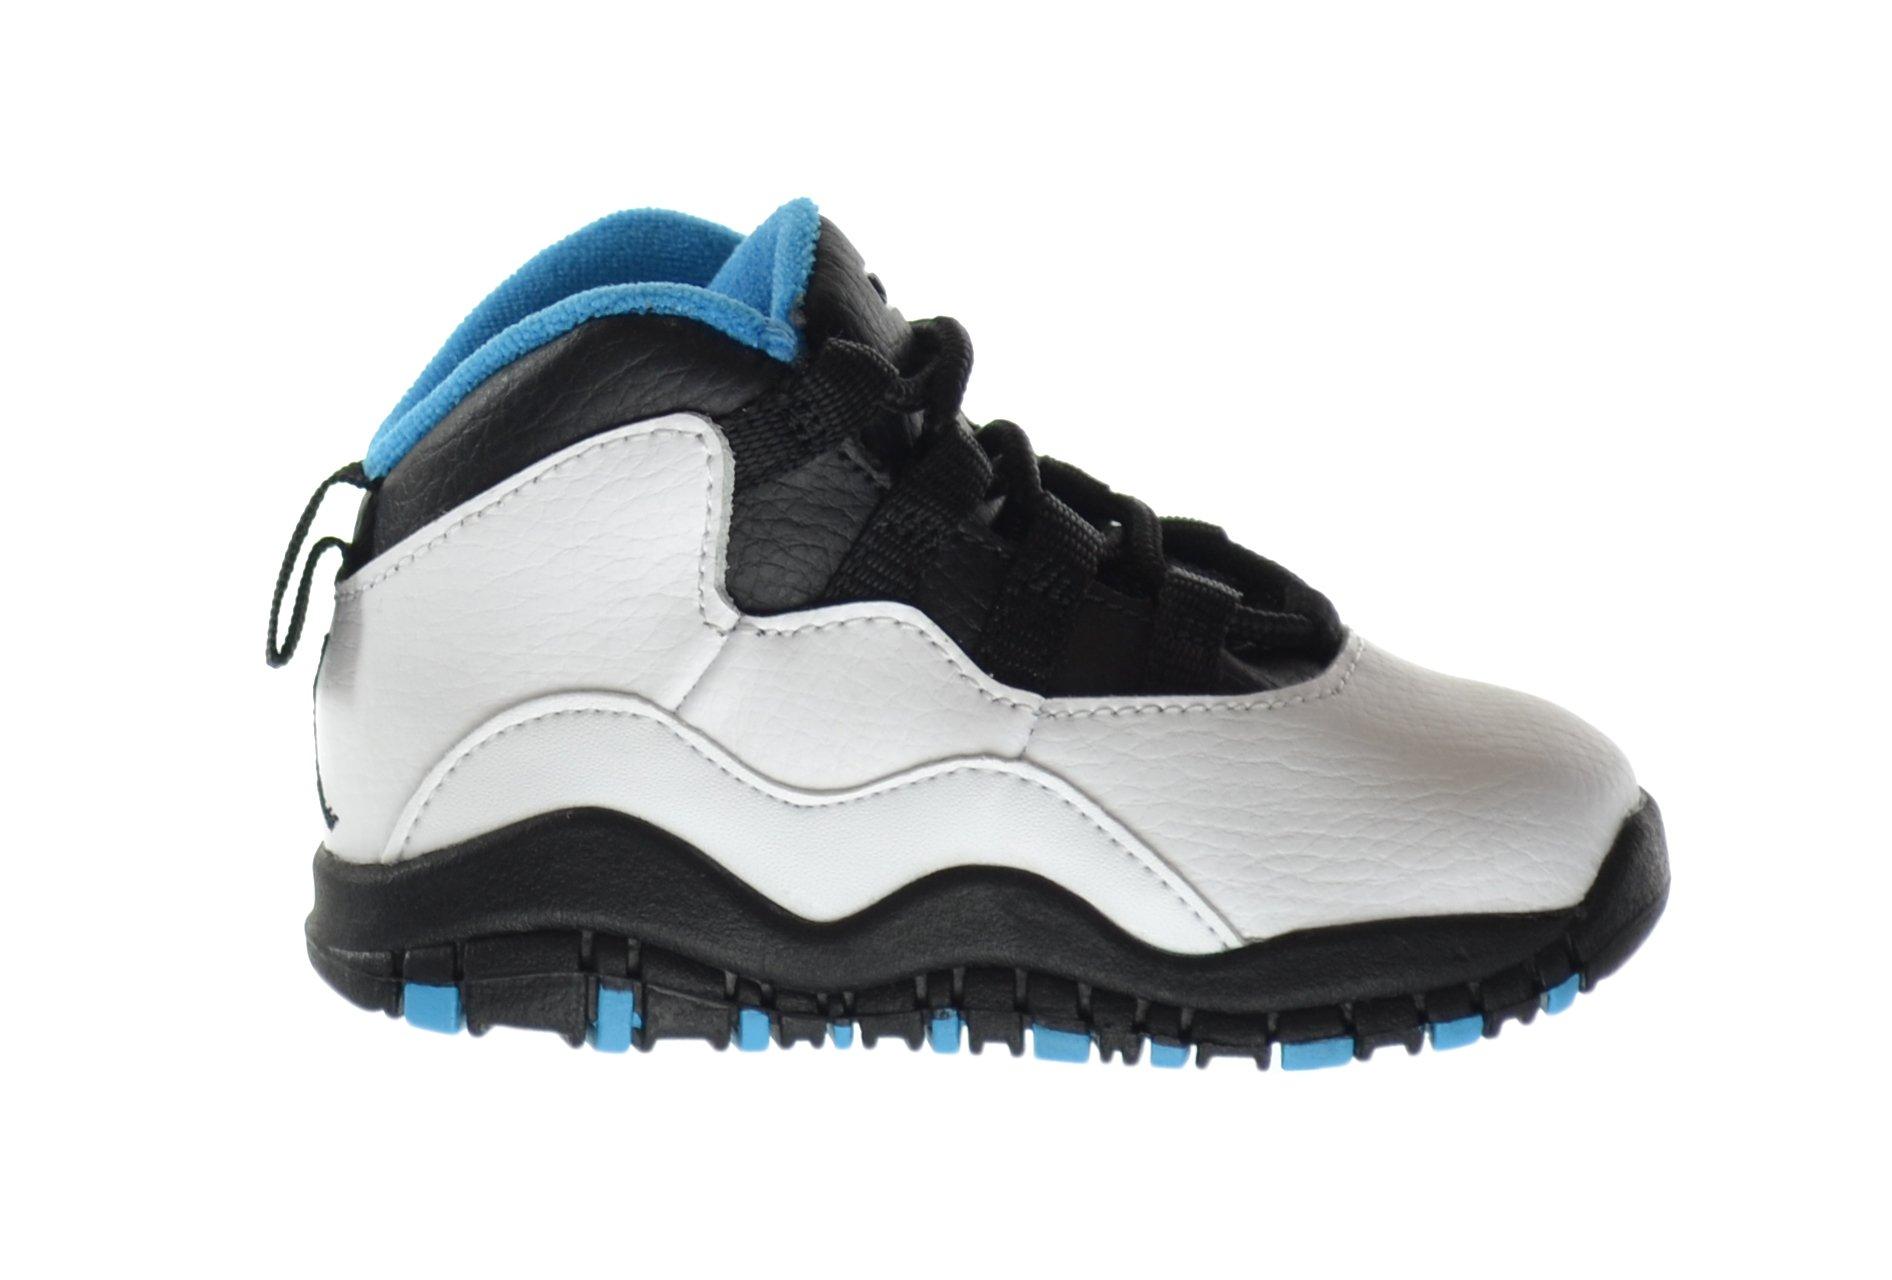 Jordan 10 Retro (TD) Baby Toddlers Basketball Shoes White/Dark Powder Blue-Black 310808-106 (9 M US) by Jordan